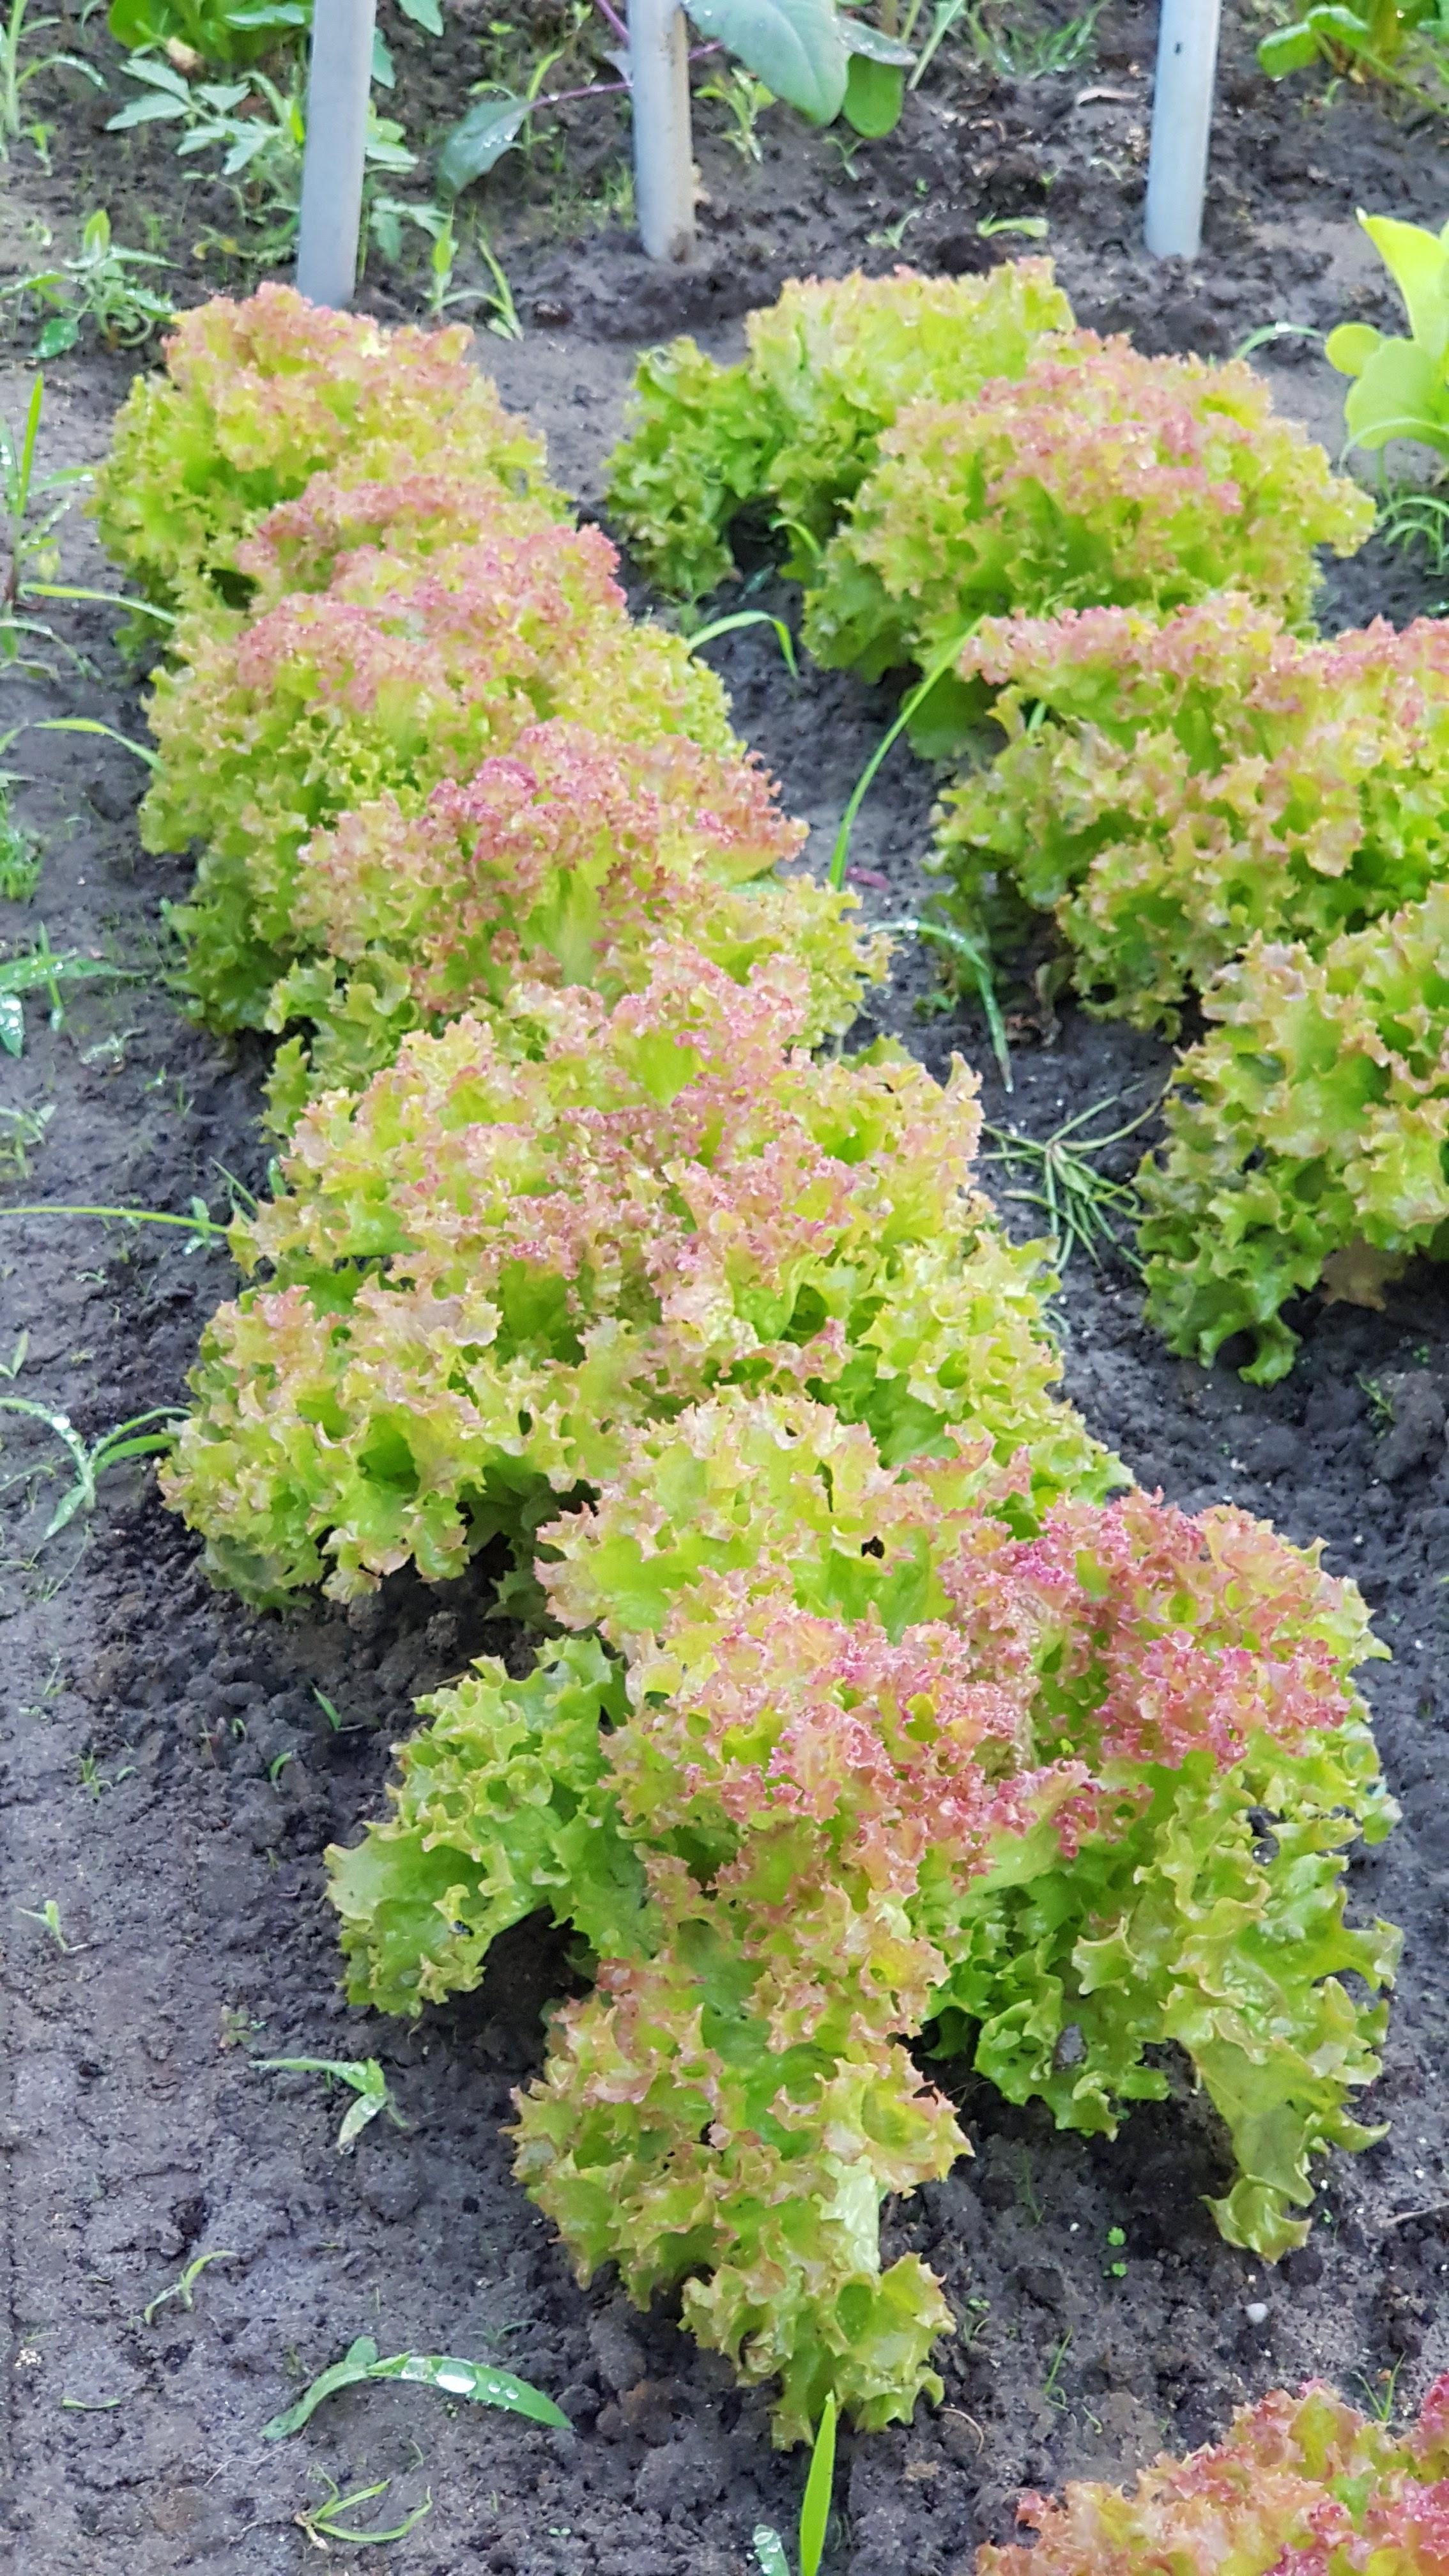 bio zöldség a Zöld Tanyán